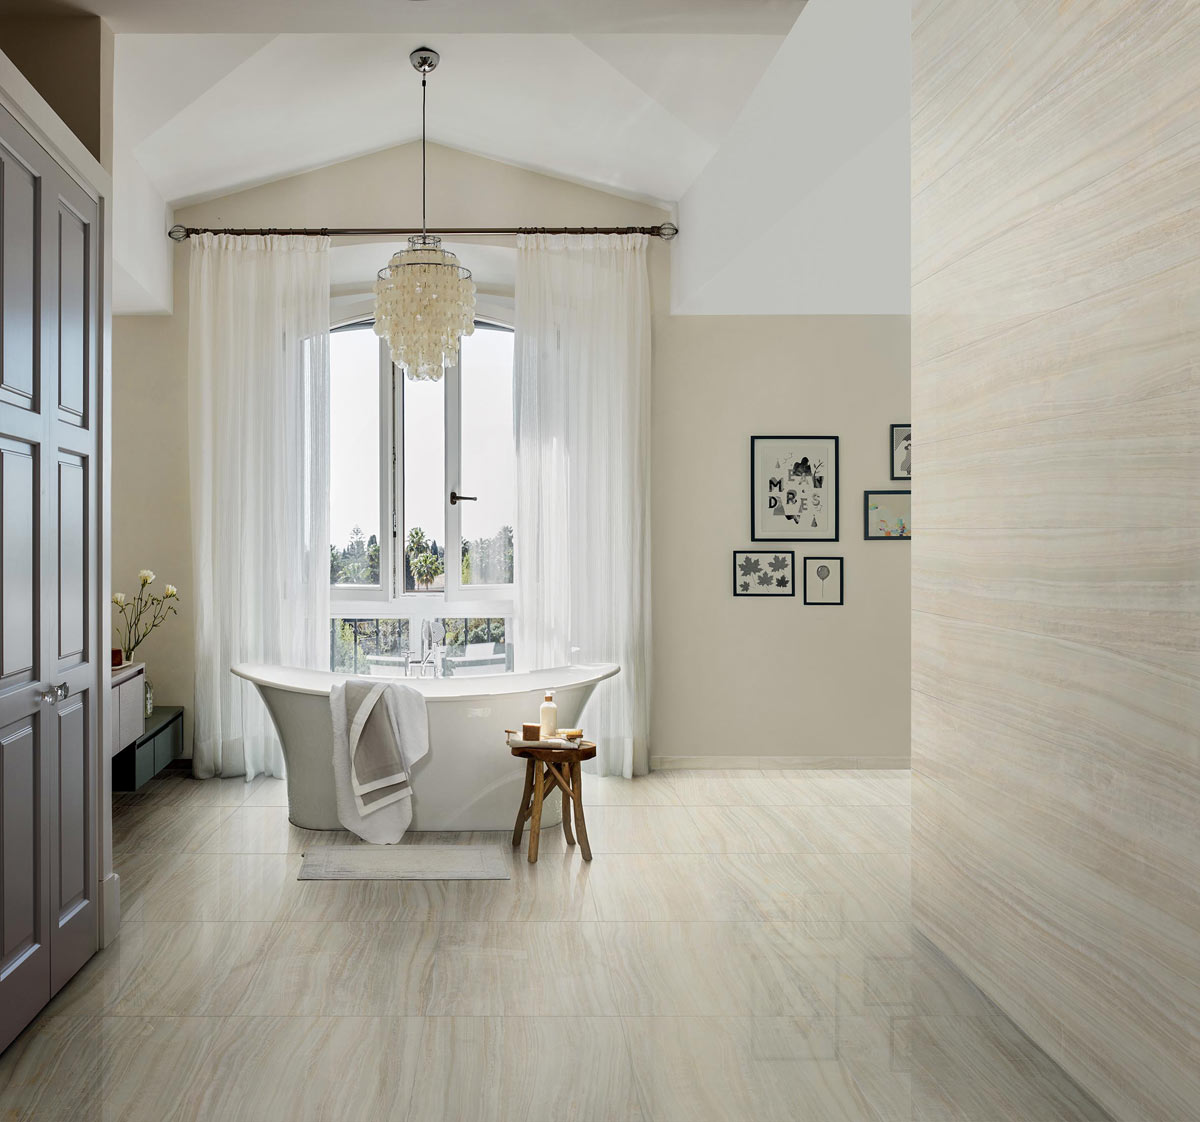 5 Trendy Design Ideas for a Dreamy Bathroom | btw - baths tiles ...